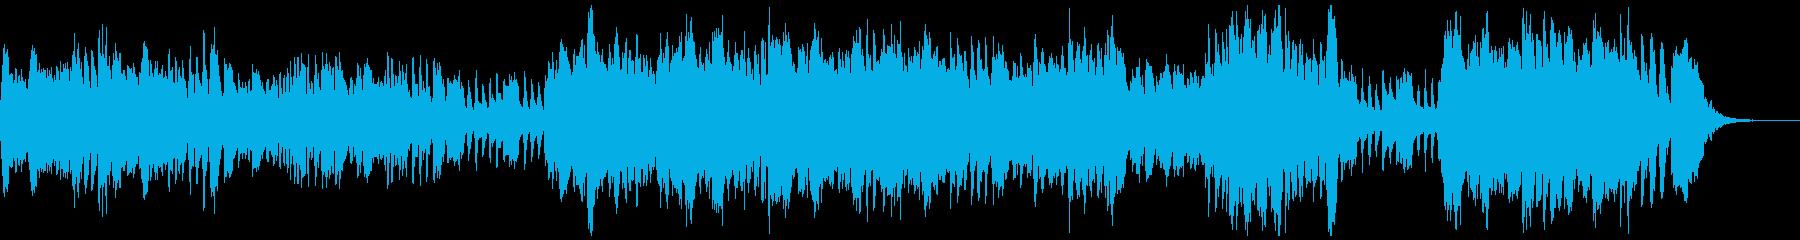 BWV1067/2『ロンドー』バッハの再生済みの波形